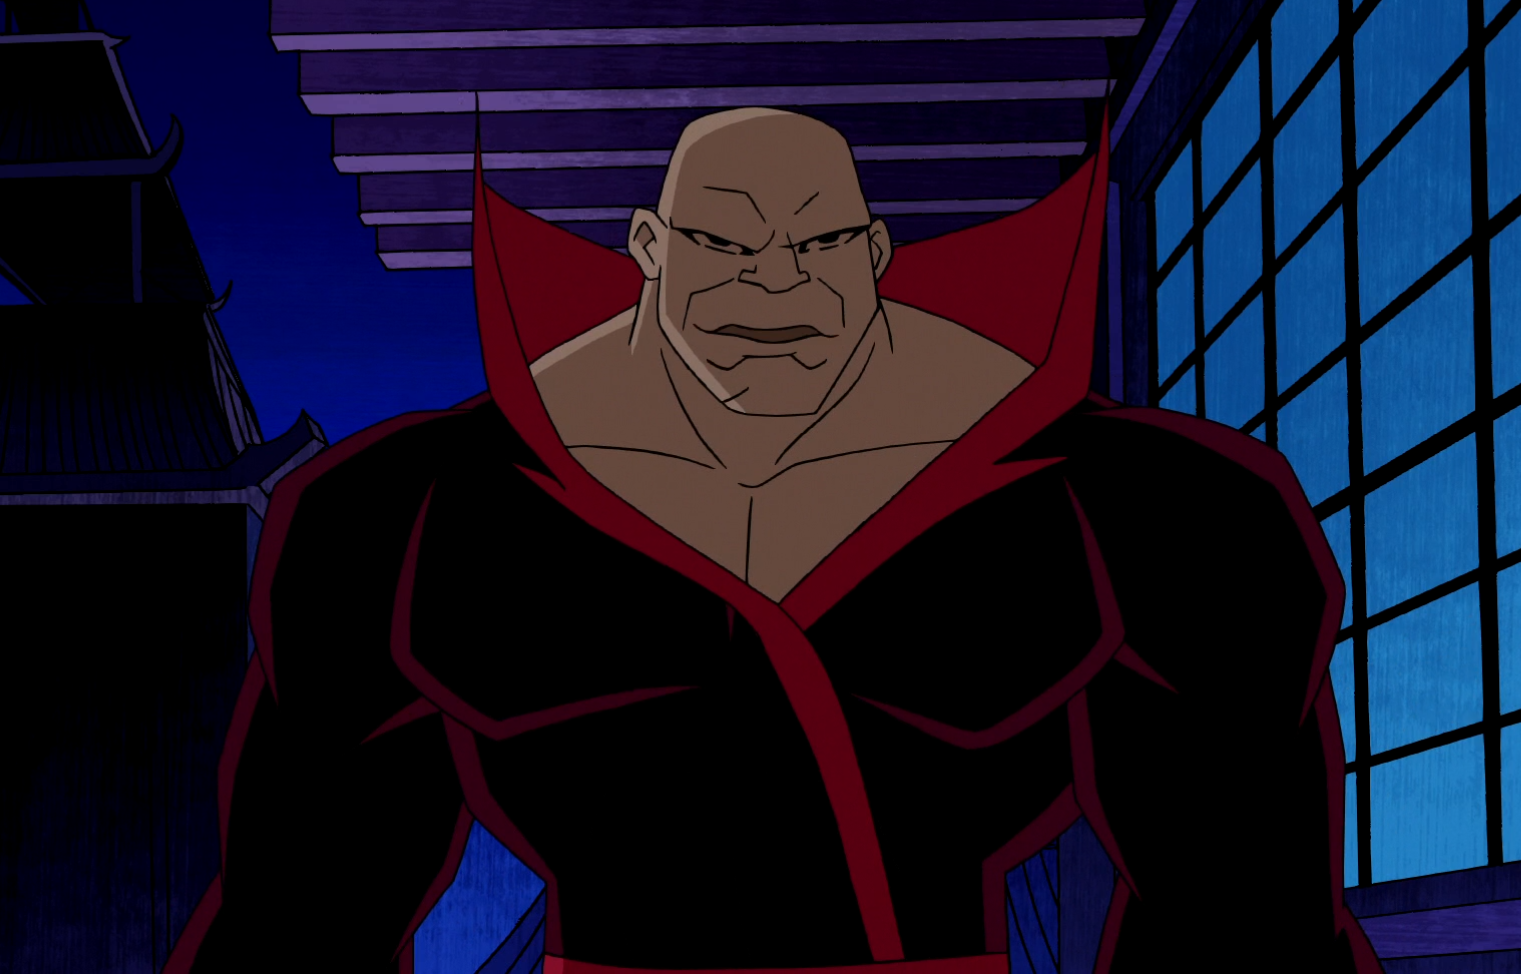 File:Katarou Teen Titans.png